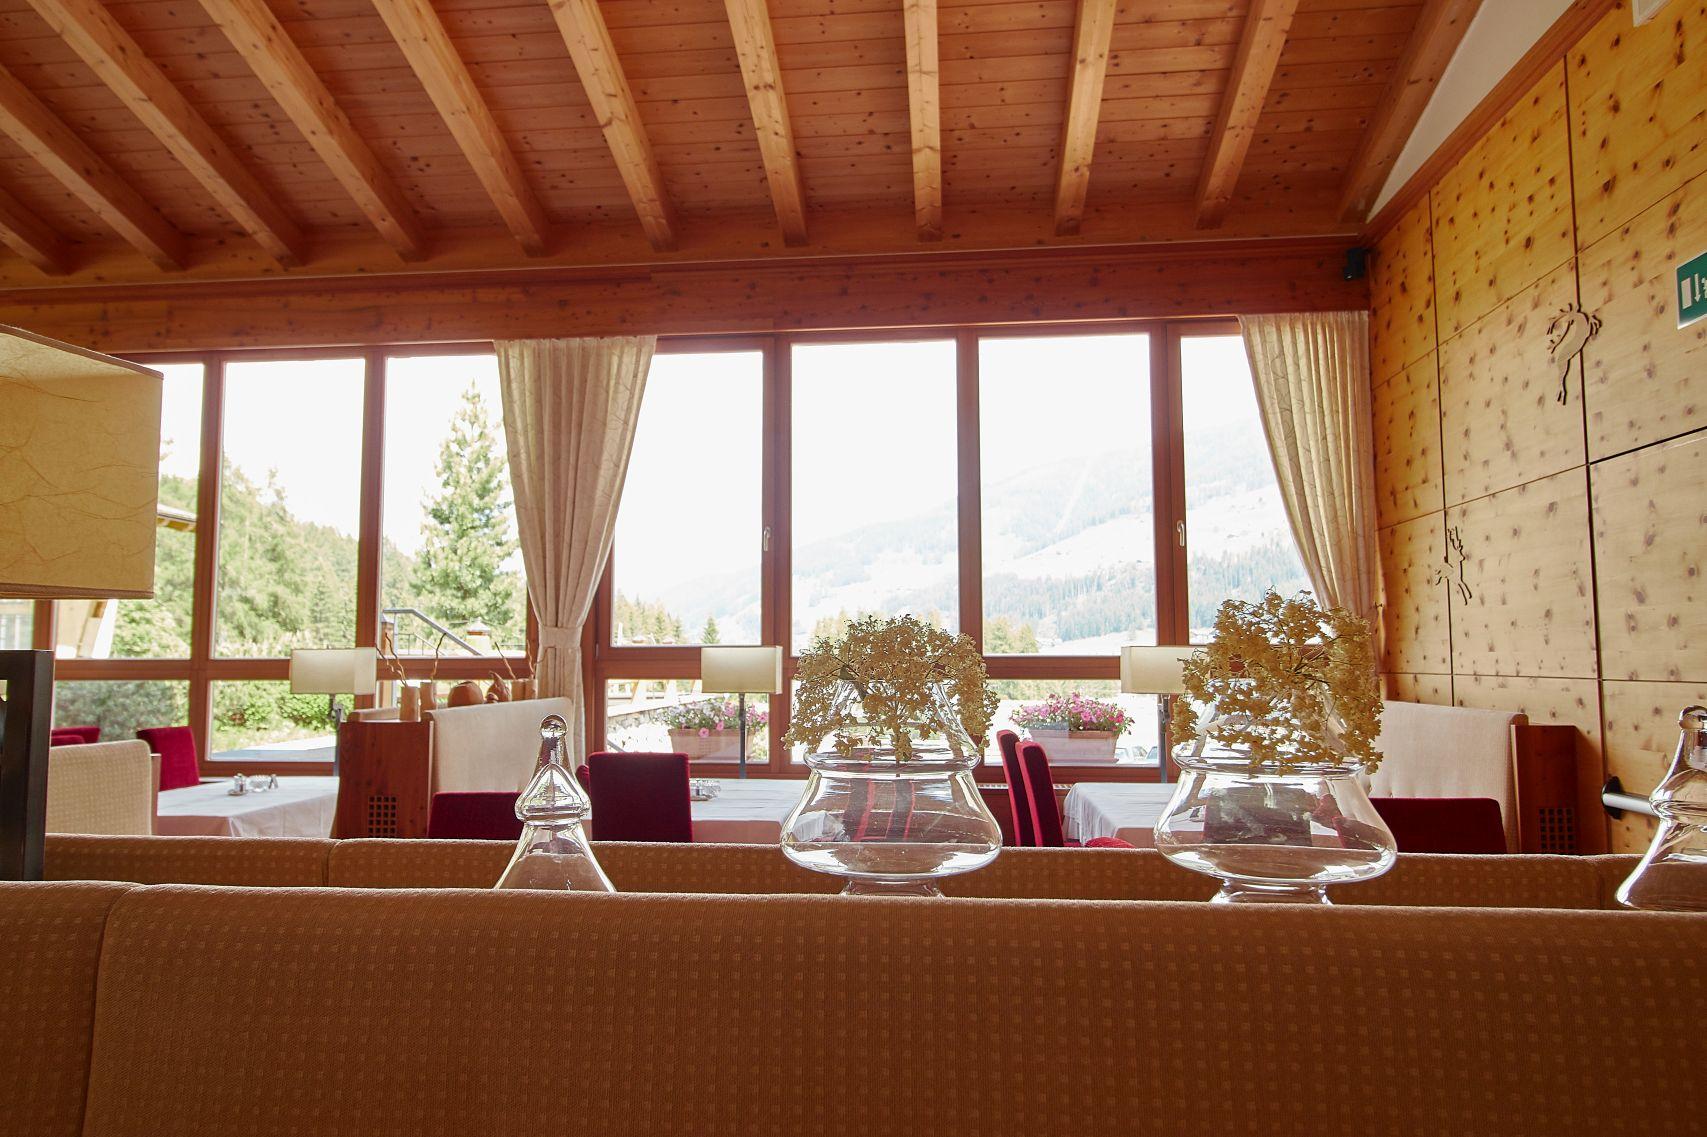 Restaurant im Bad Moos Dolomites Spa Resort in Sexten